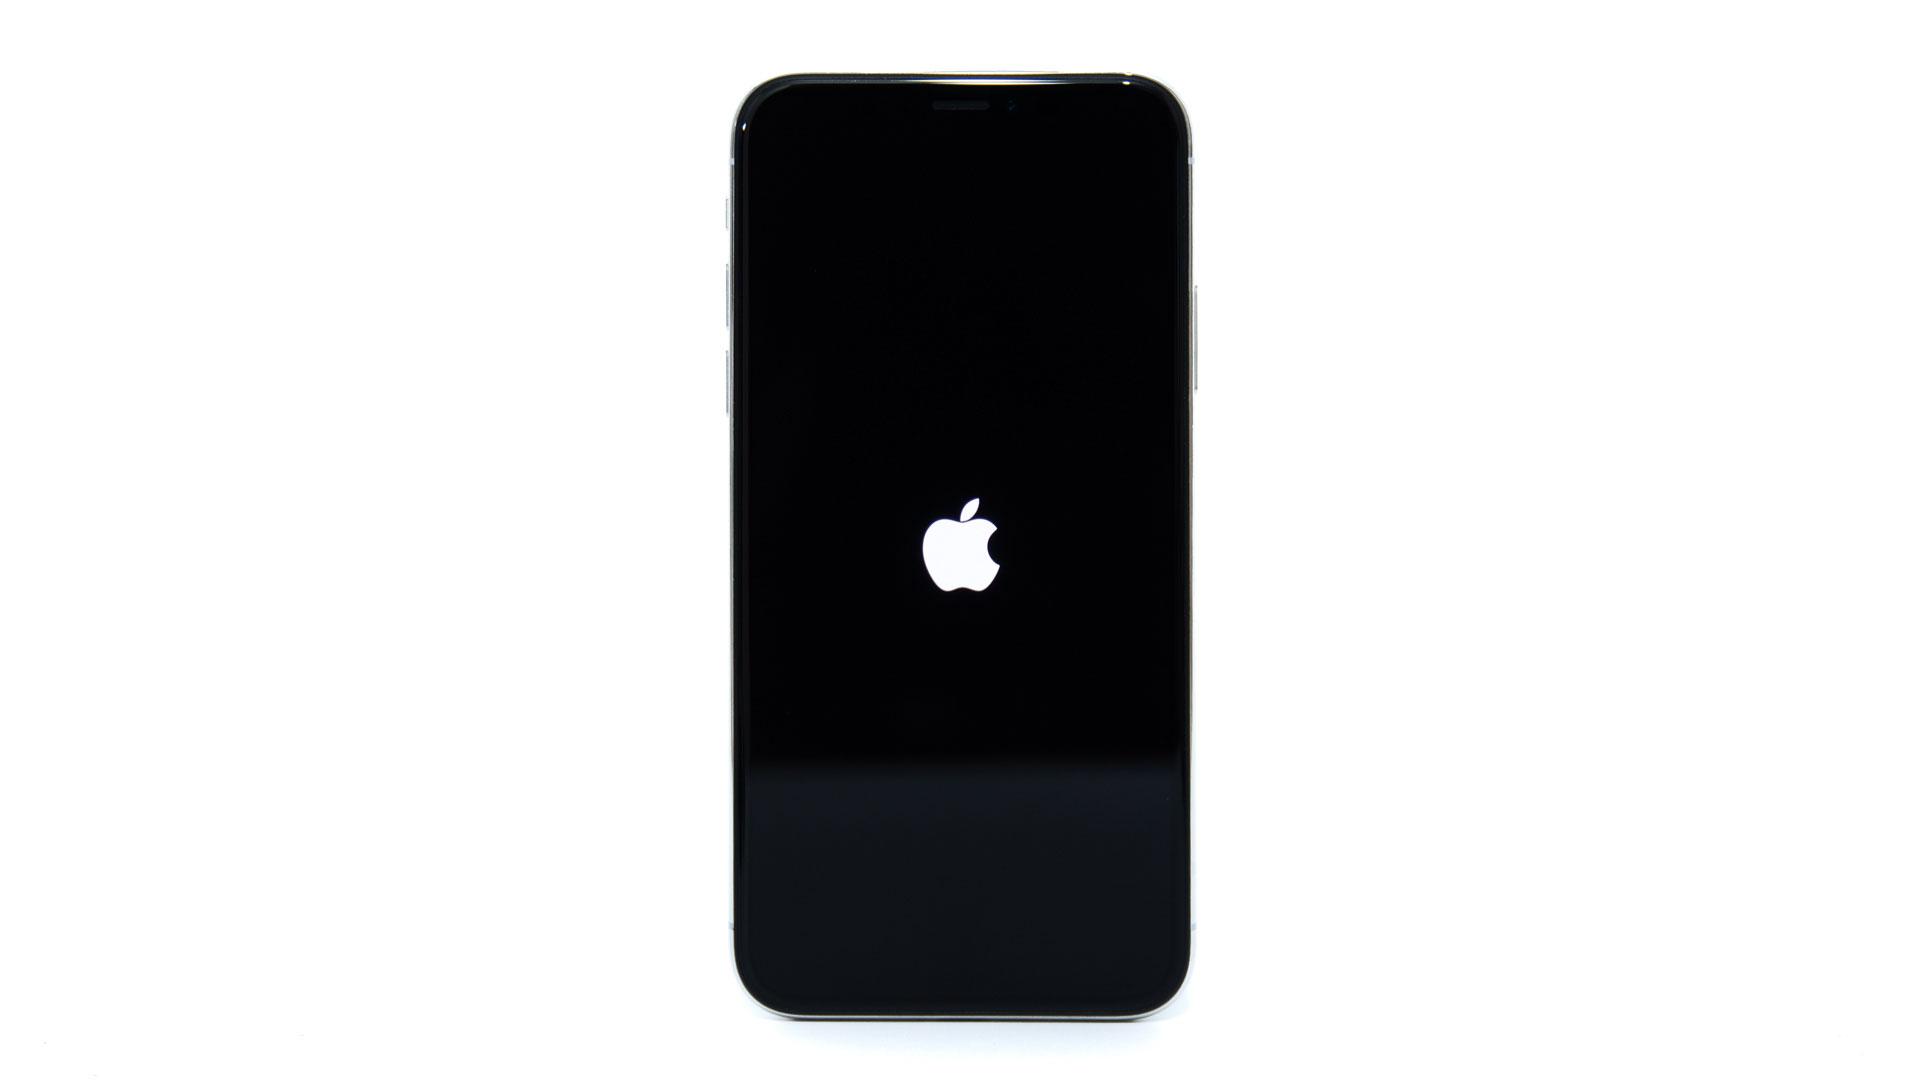 iPhone X / 8 / 8 Plusを強制的に再起動させる方法